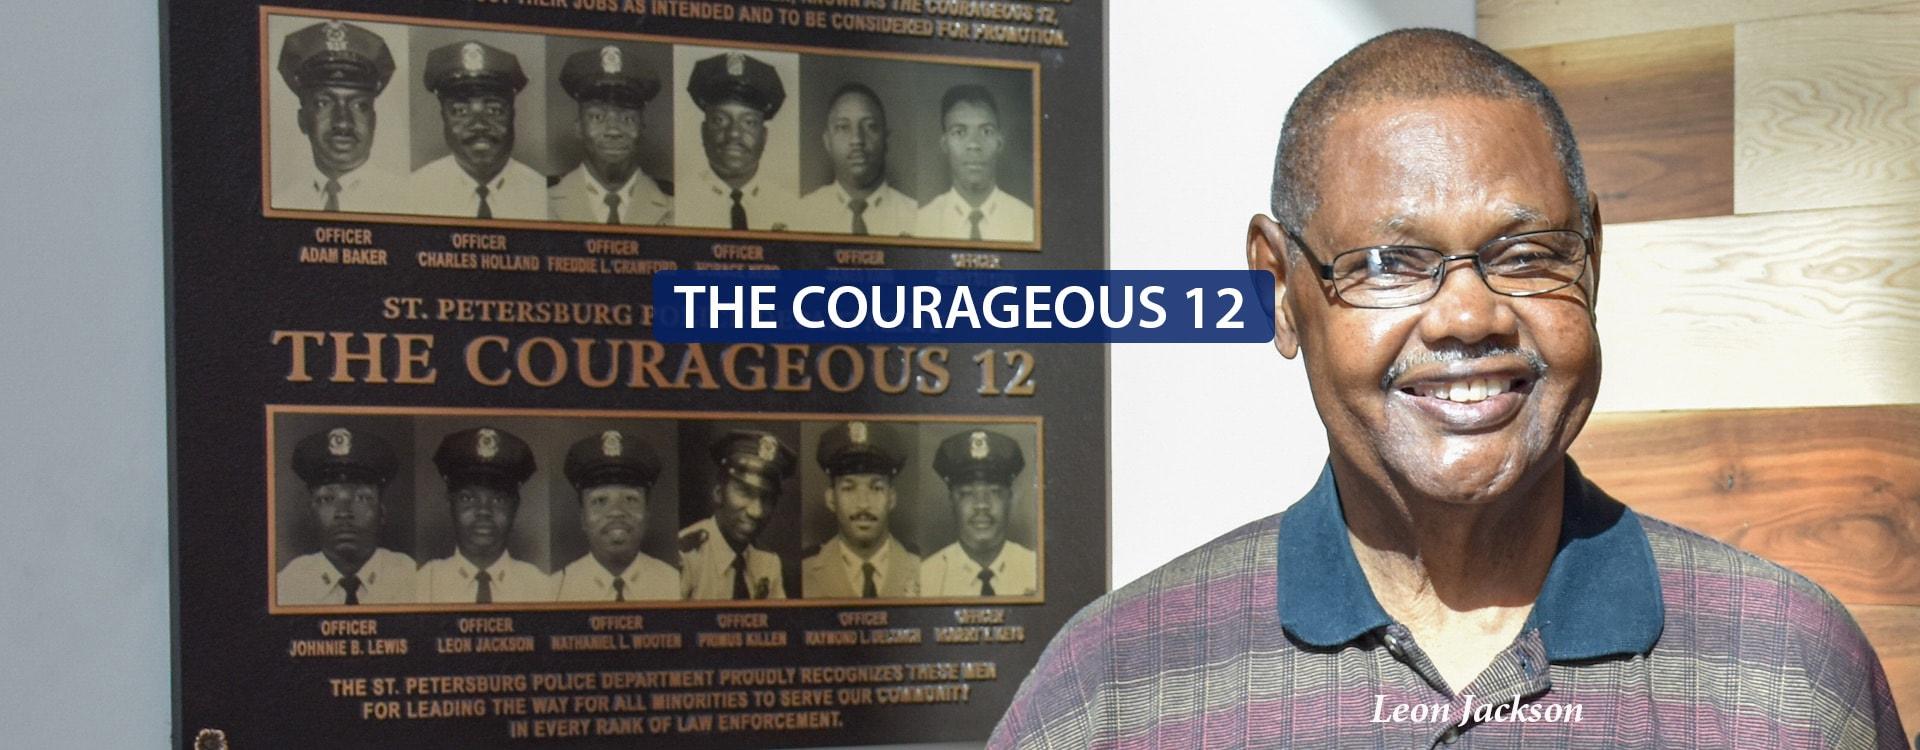 courageous12-header-750px